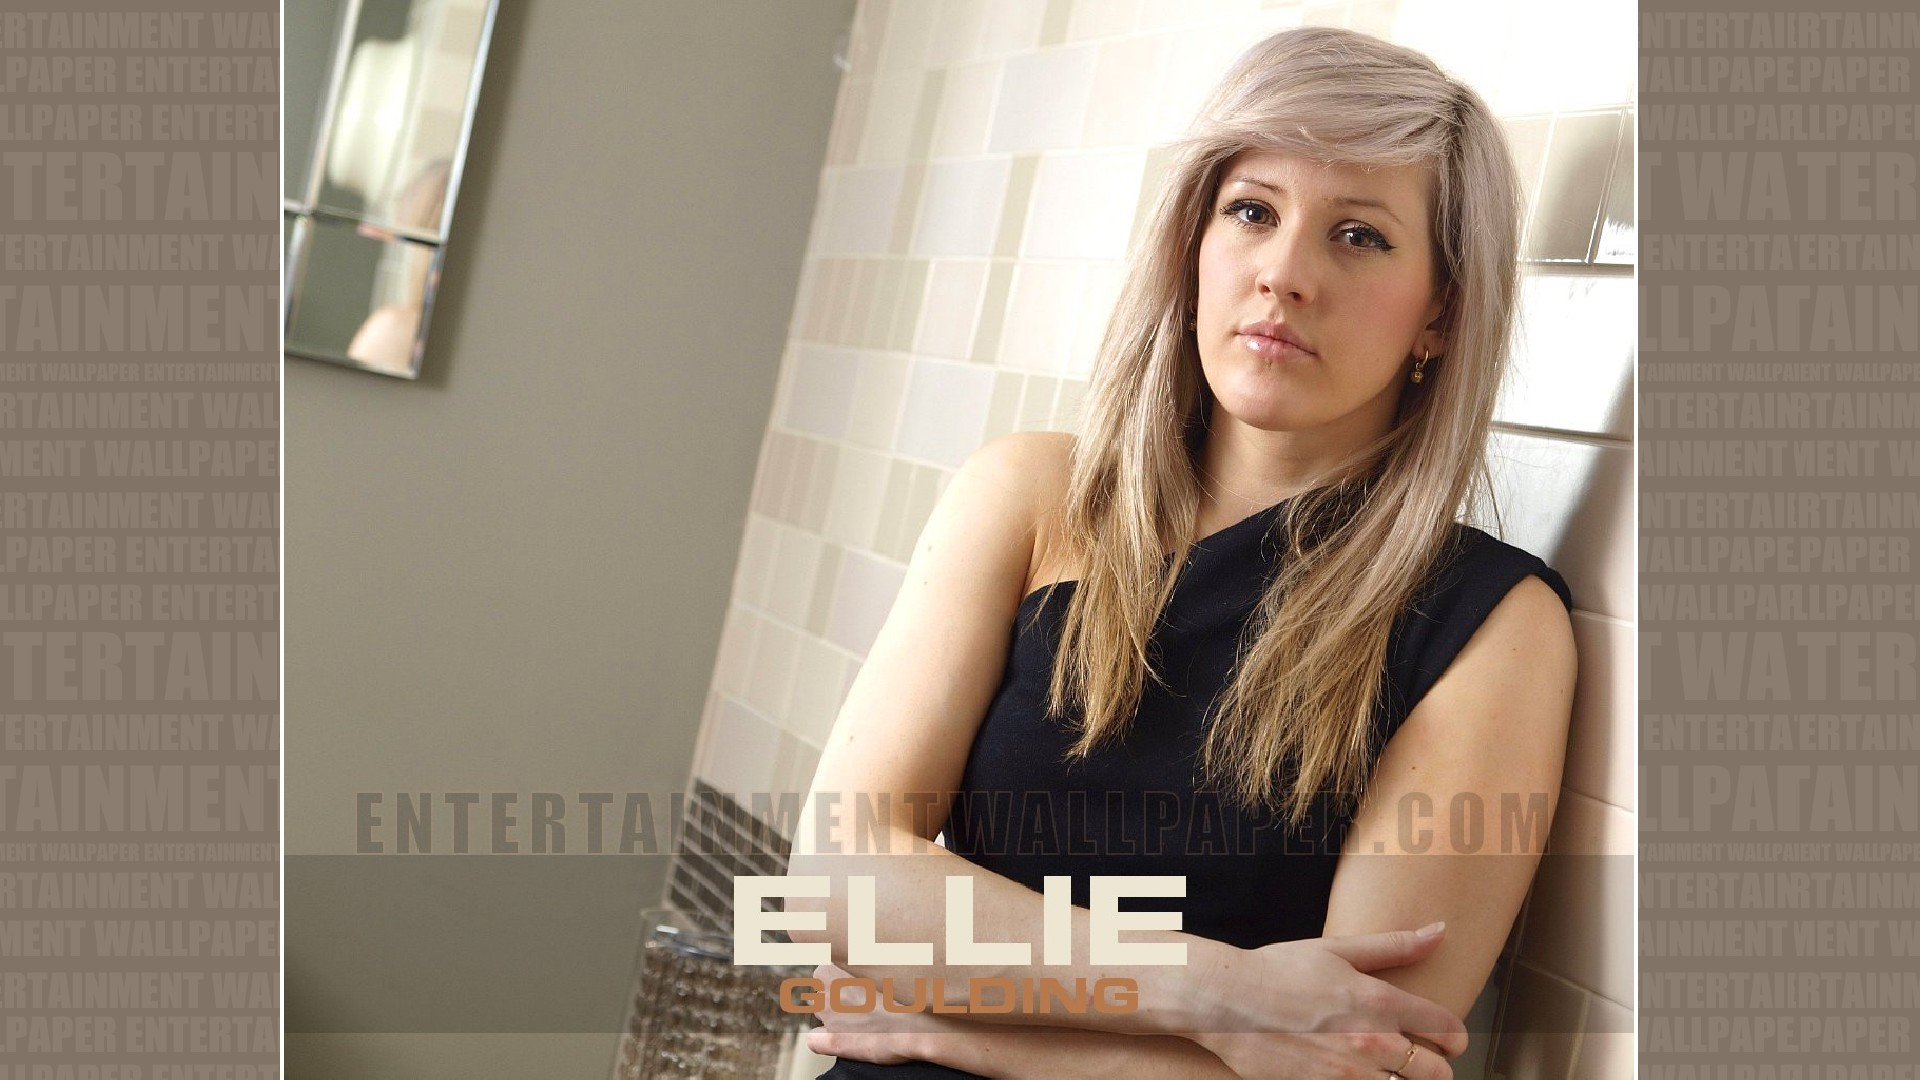 Ellie Goulding Wallpaper – Original size, download now.